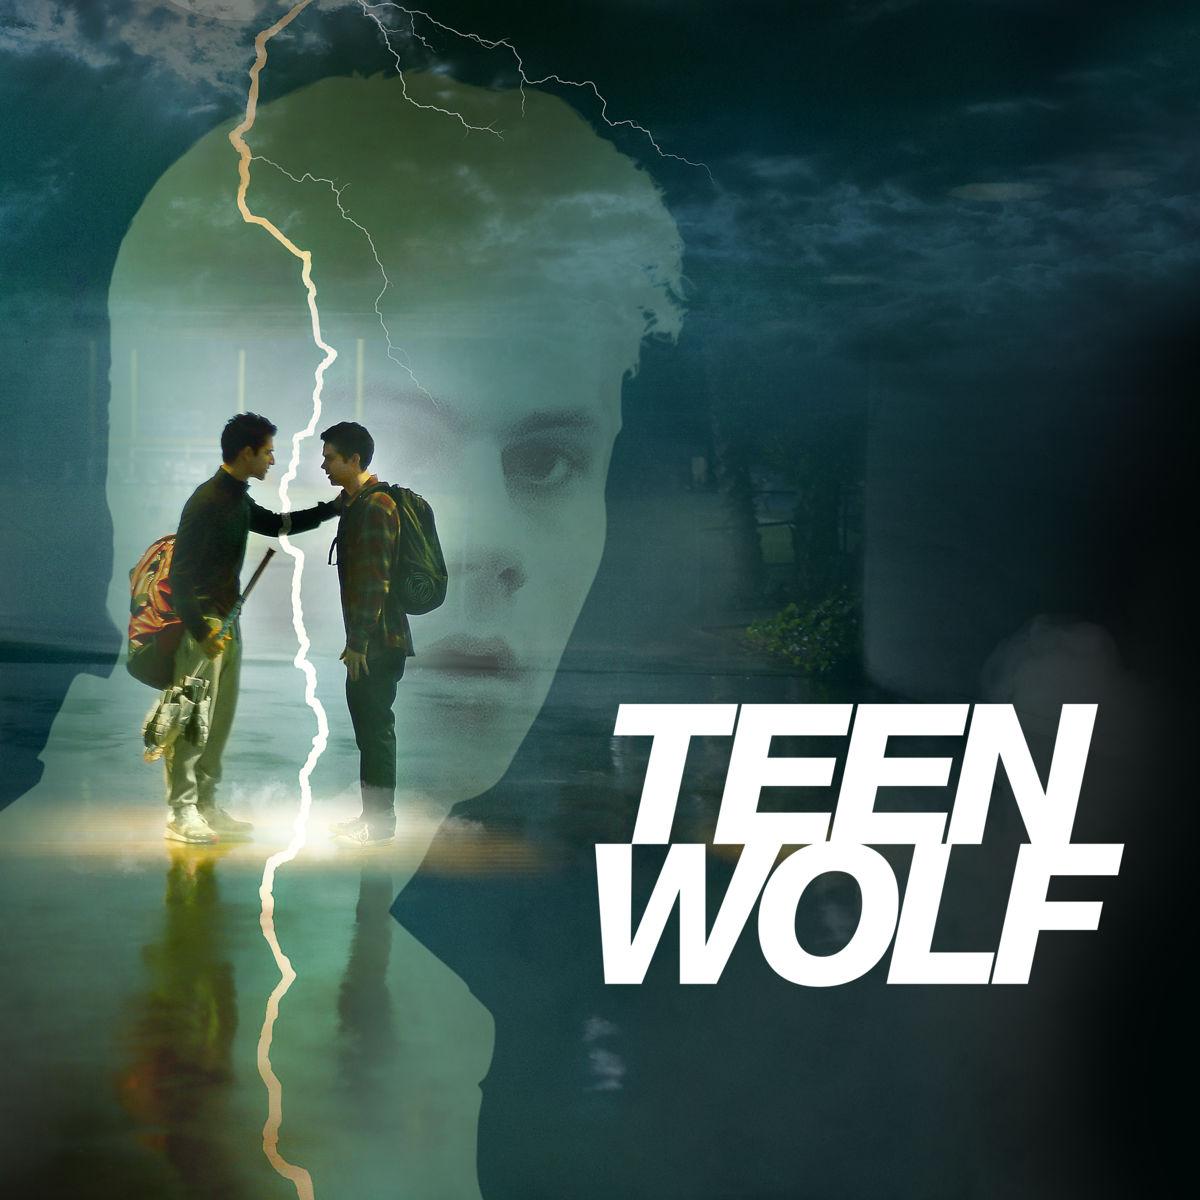 Teen wolf season 6 png transparent download Ultimate Music | Teen Wolf (Season 6) | Returns in June! png transparent download